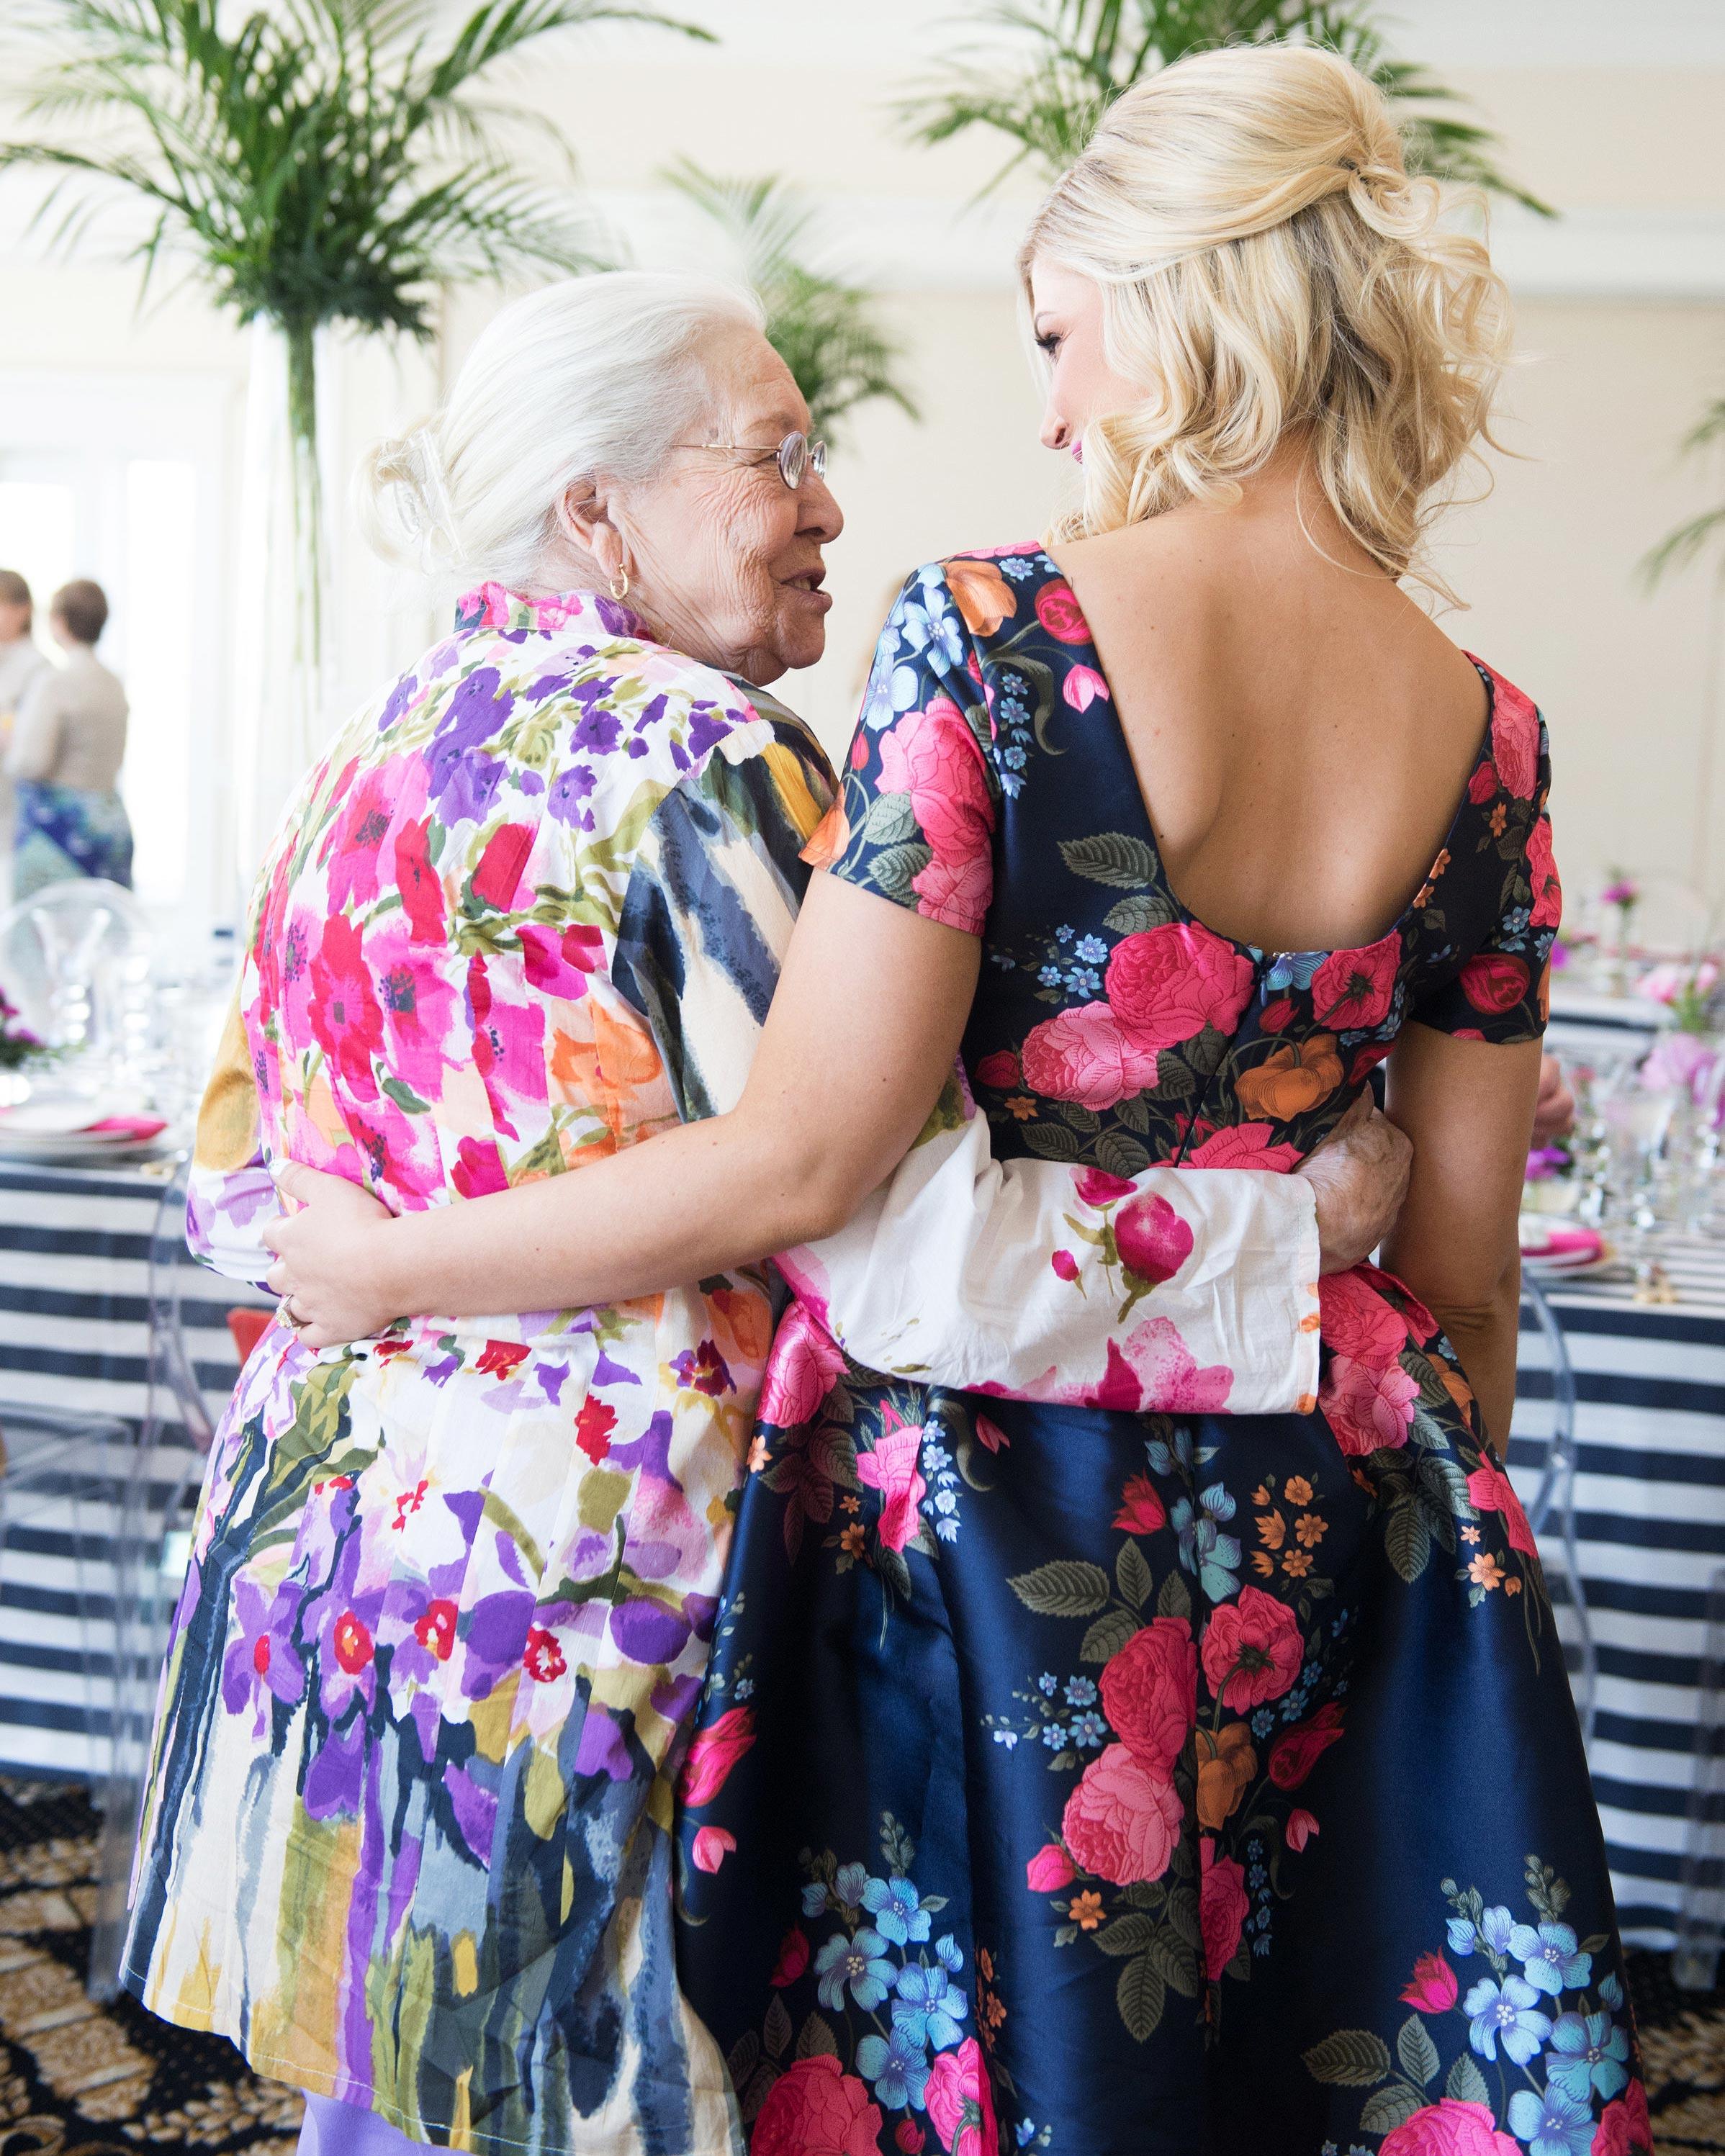 adrienne-bridal-shower-guests-51-6134175-0716.jpg